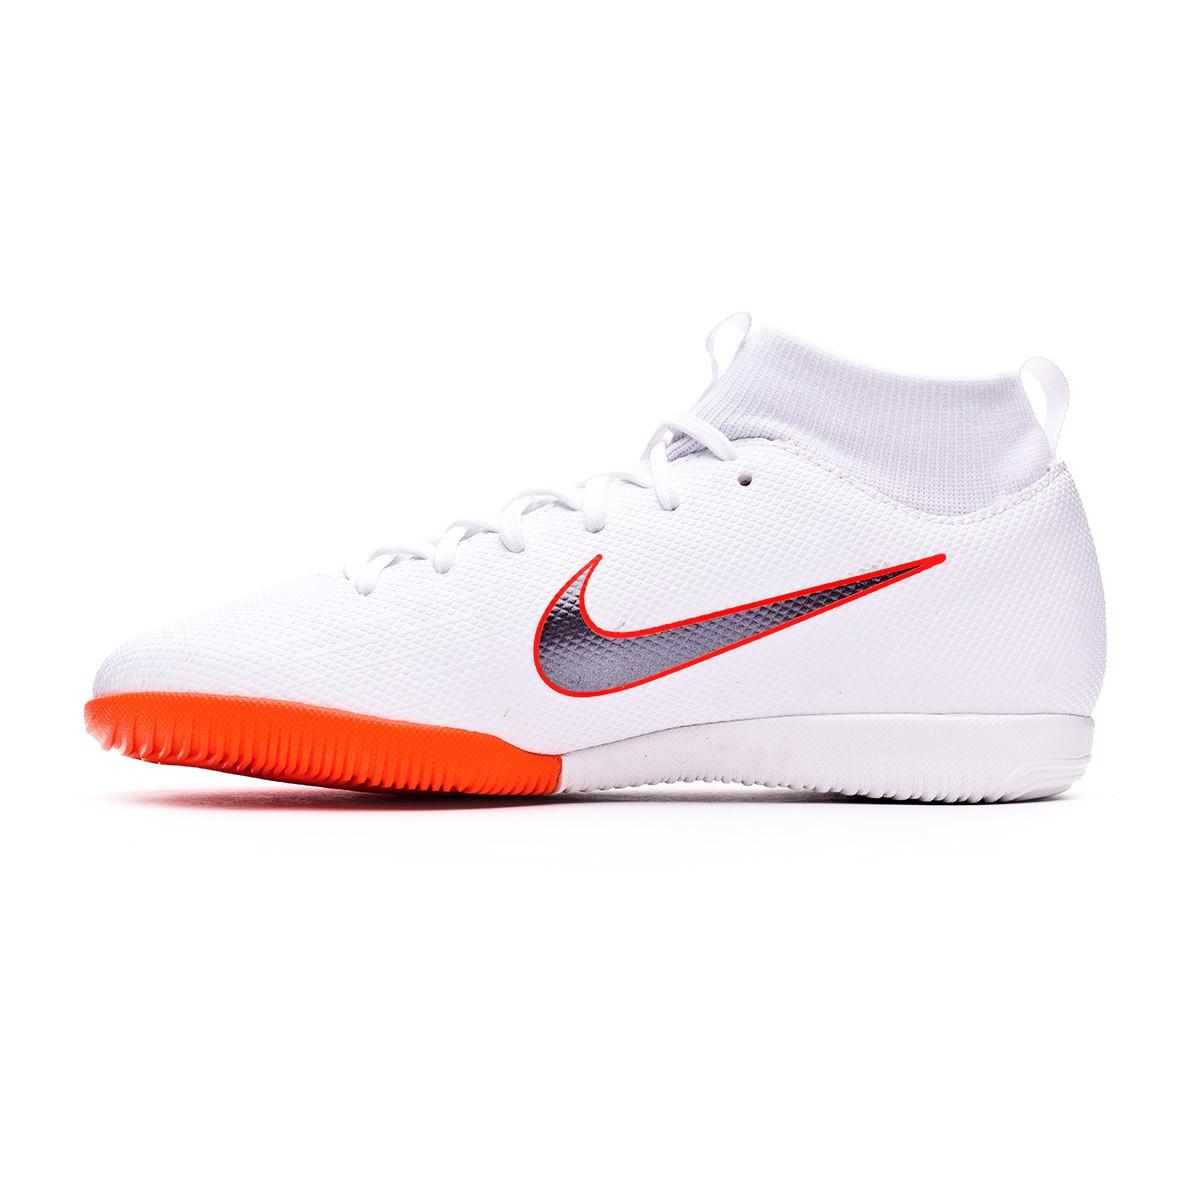 747cece70c29 Futsal Boot Nike Kids Mercurial SuperflyX VI Academy GS IC White-Metallic  cool grey-Total orange - Football store Fútbol Emotion